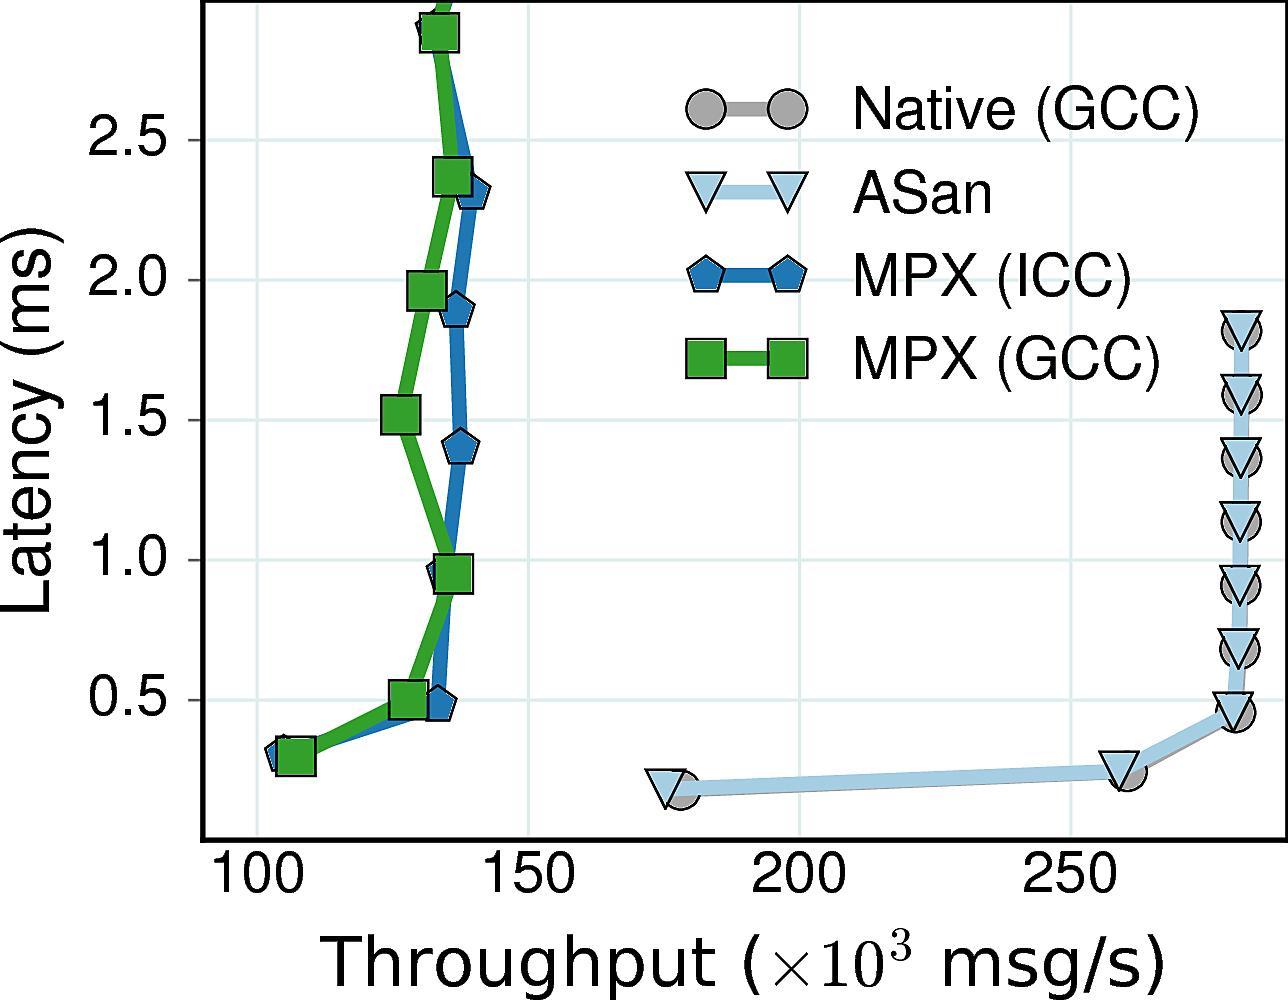 Memcached throughput-latency plot